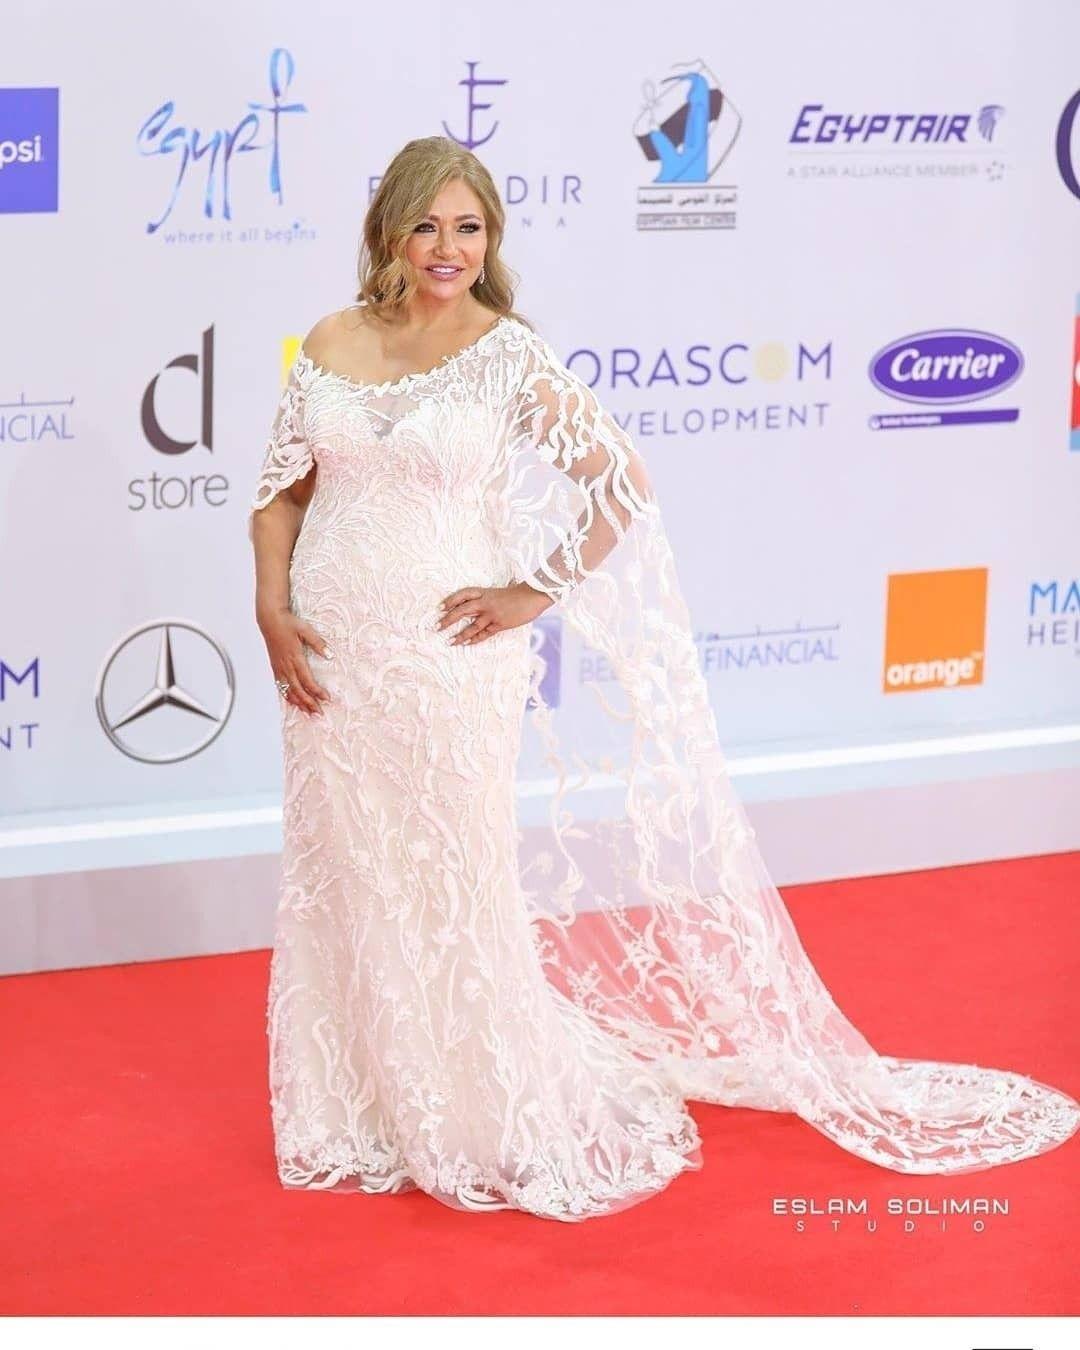 Laila S Elwy In White Dress From El Gouna Film Festival Closing Ceremony 2019 Dresses Formal Dresses Long Instagram Fashion